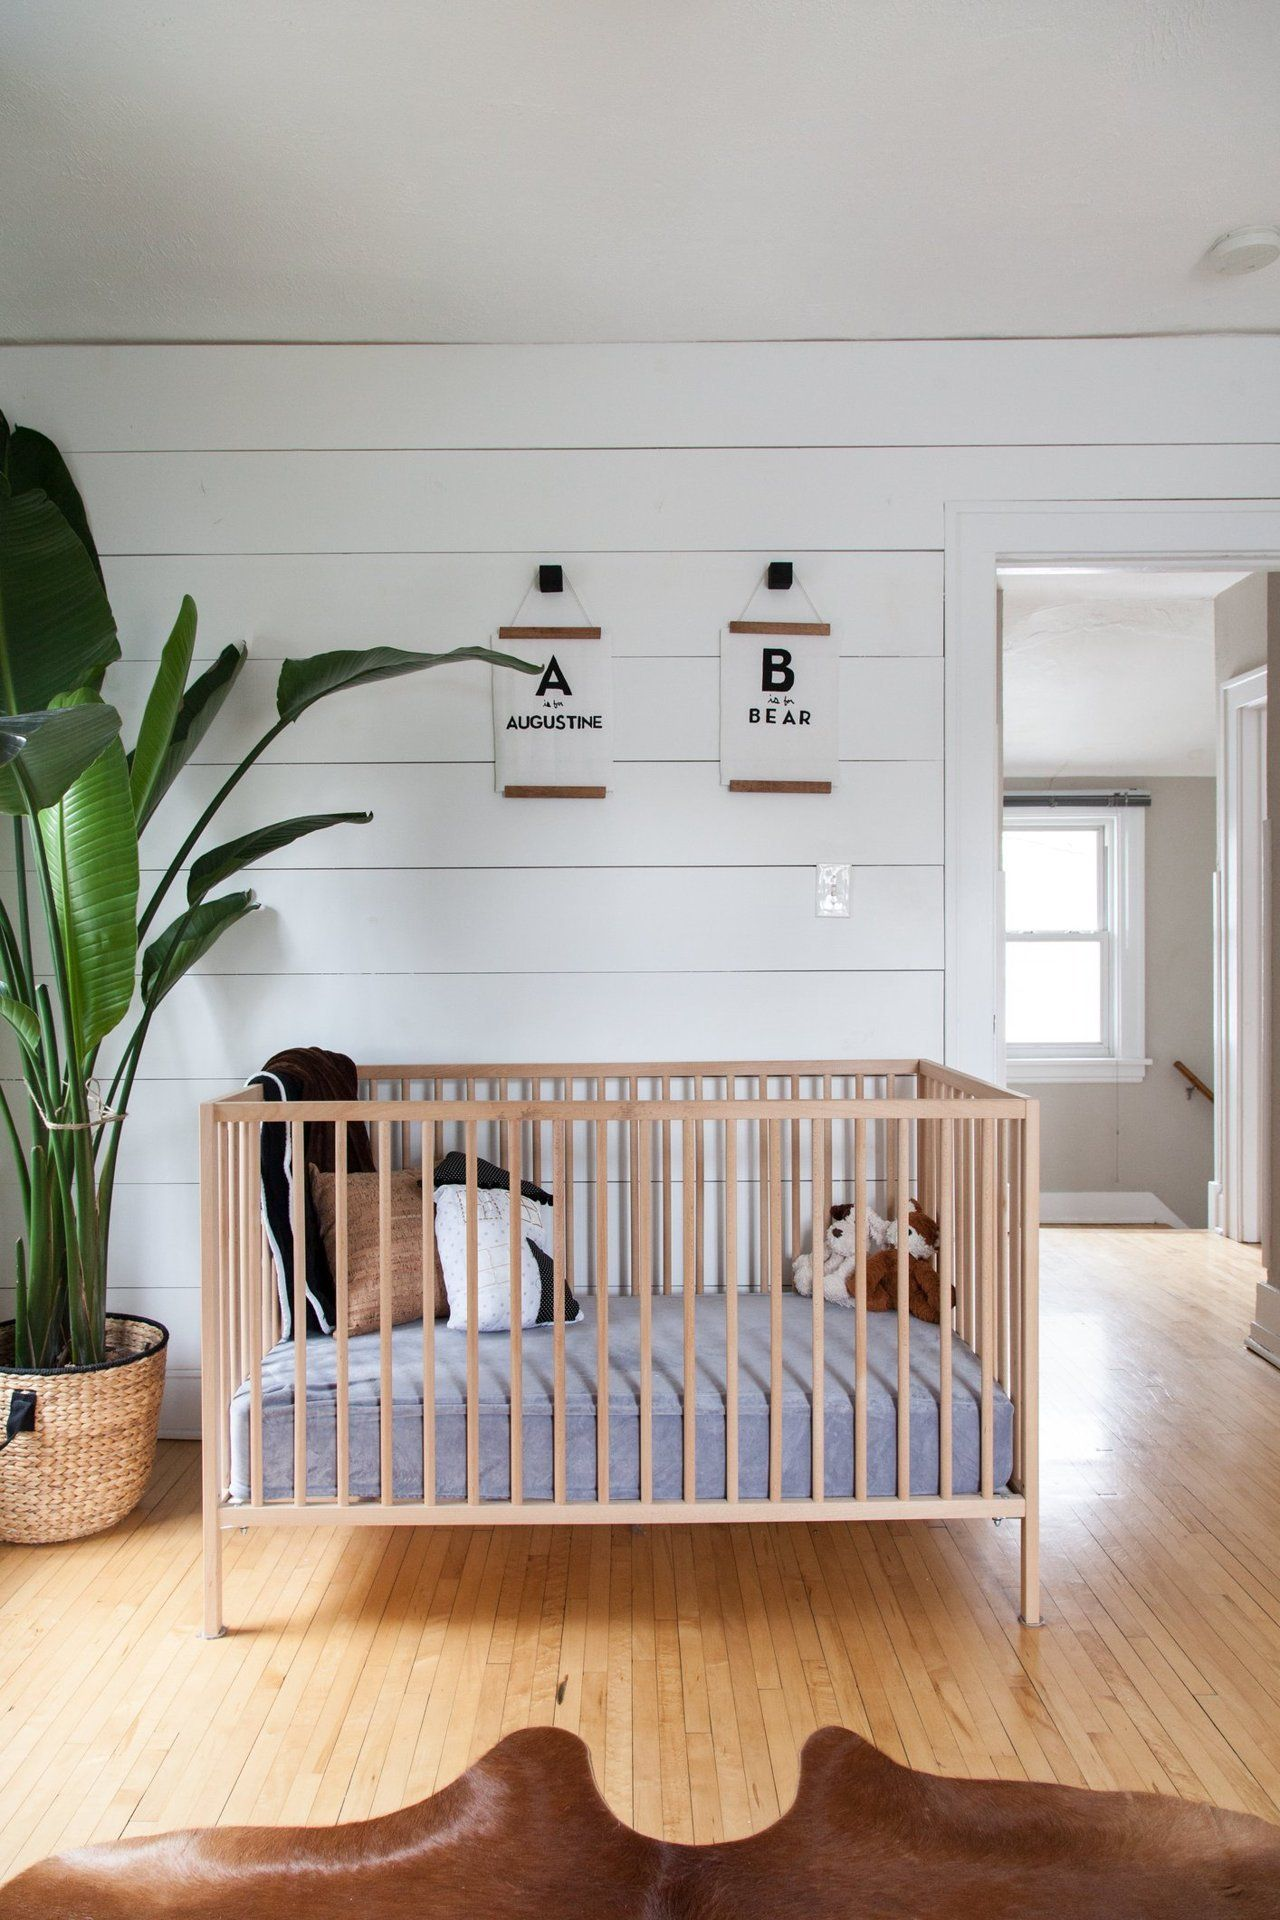 scandinavian nursery furniture. House Tour: A Light \u0026 Simple Scandinavian-Inspired Home Scandinavian Nursery Furniture